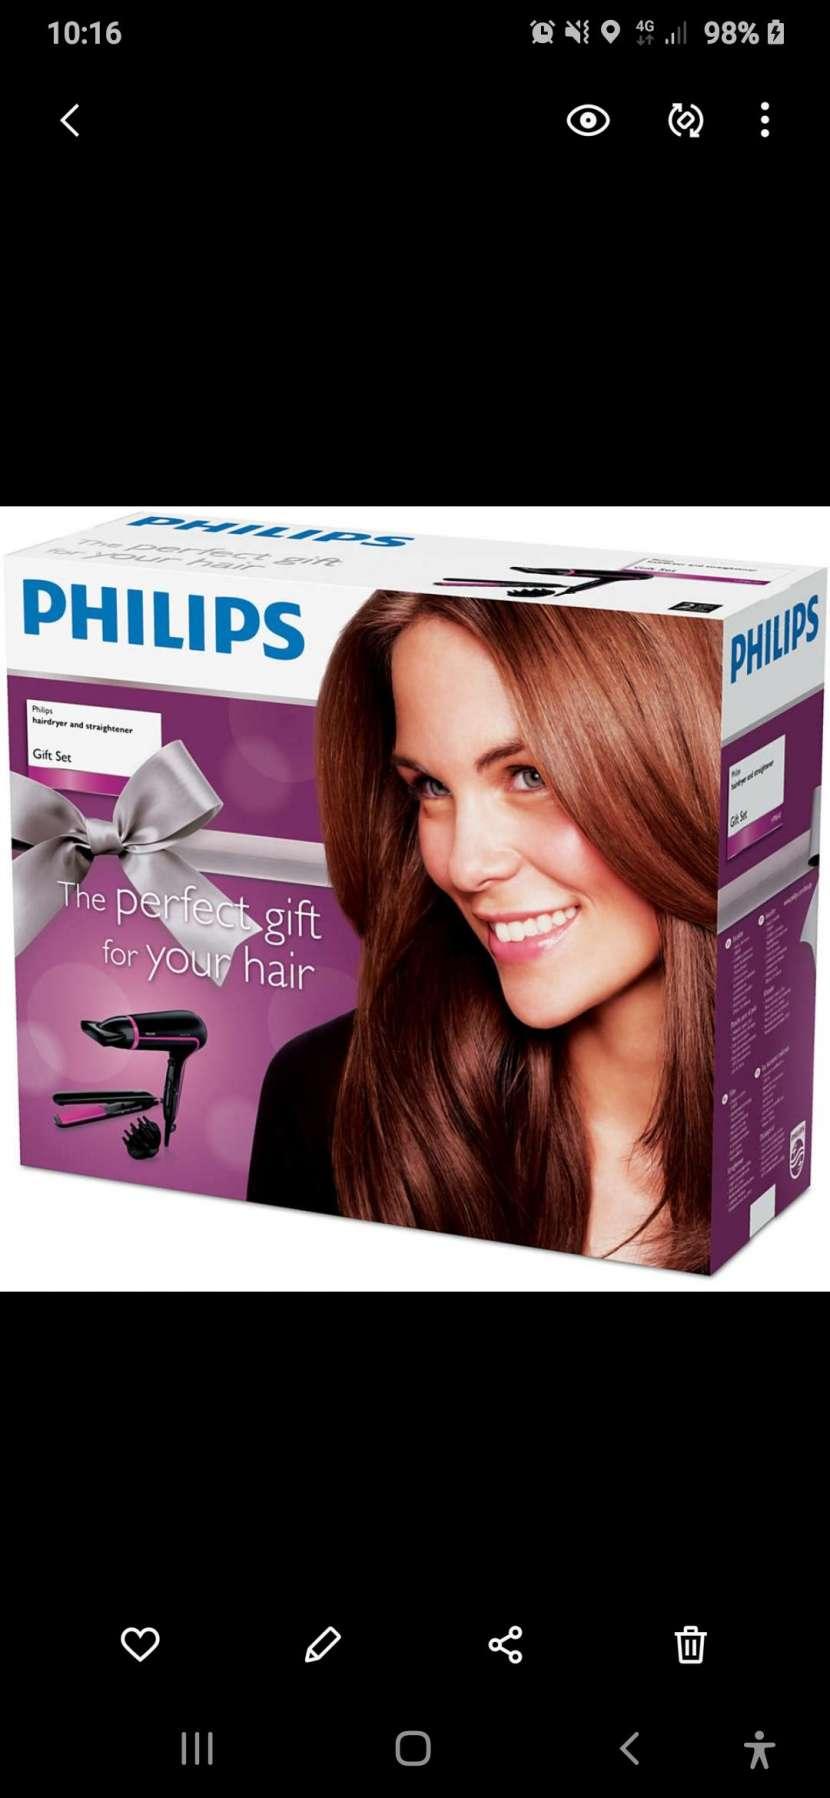 Kit Philips 8640 - 0